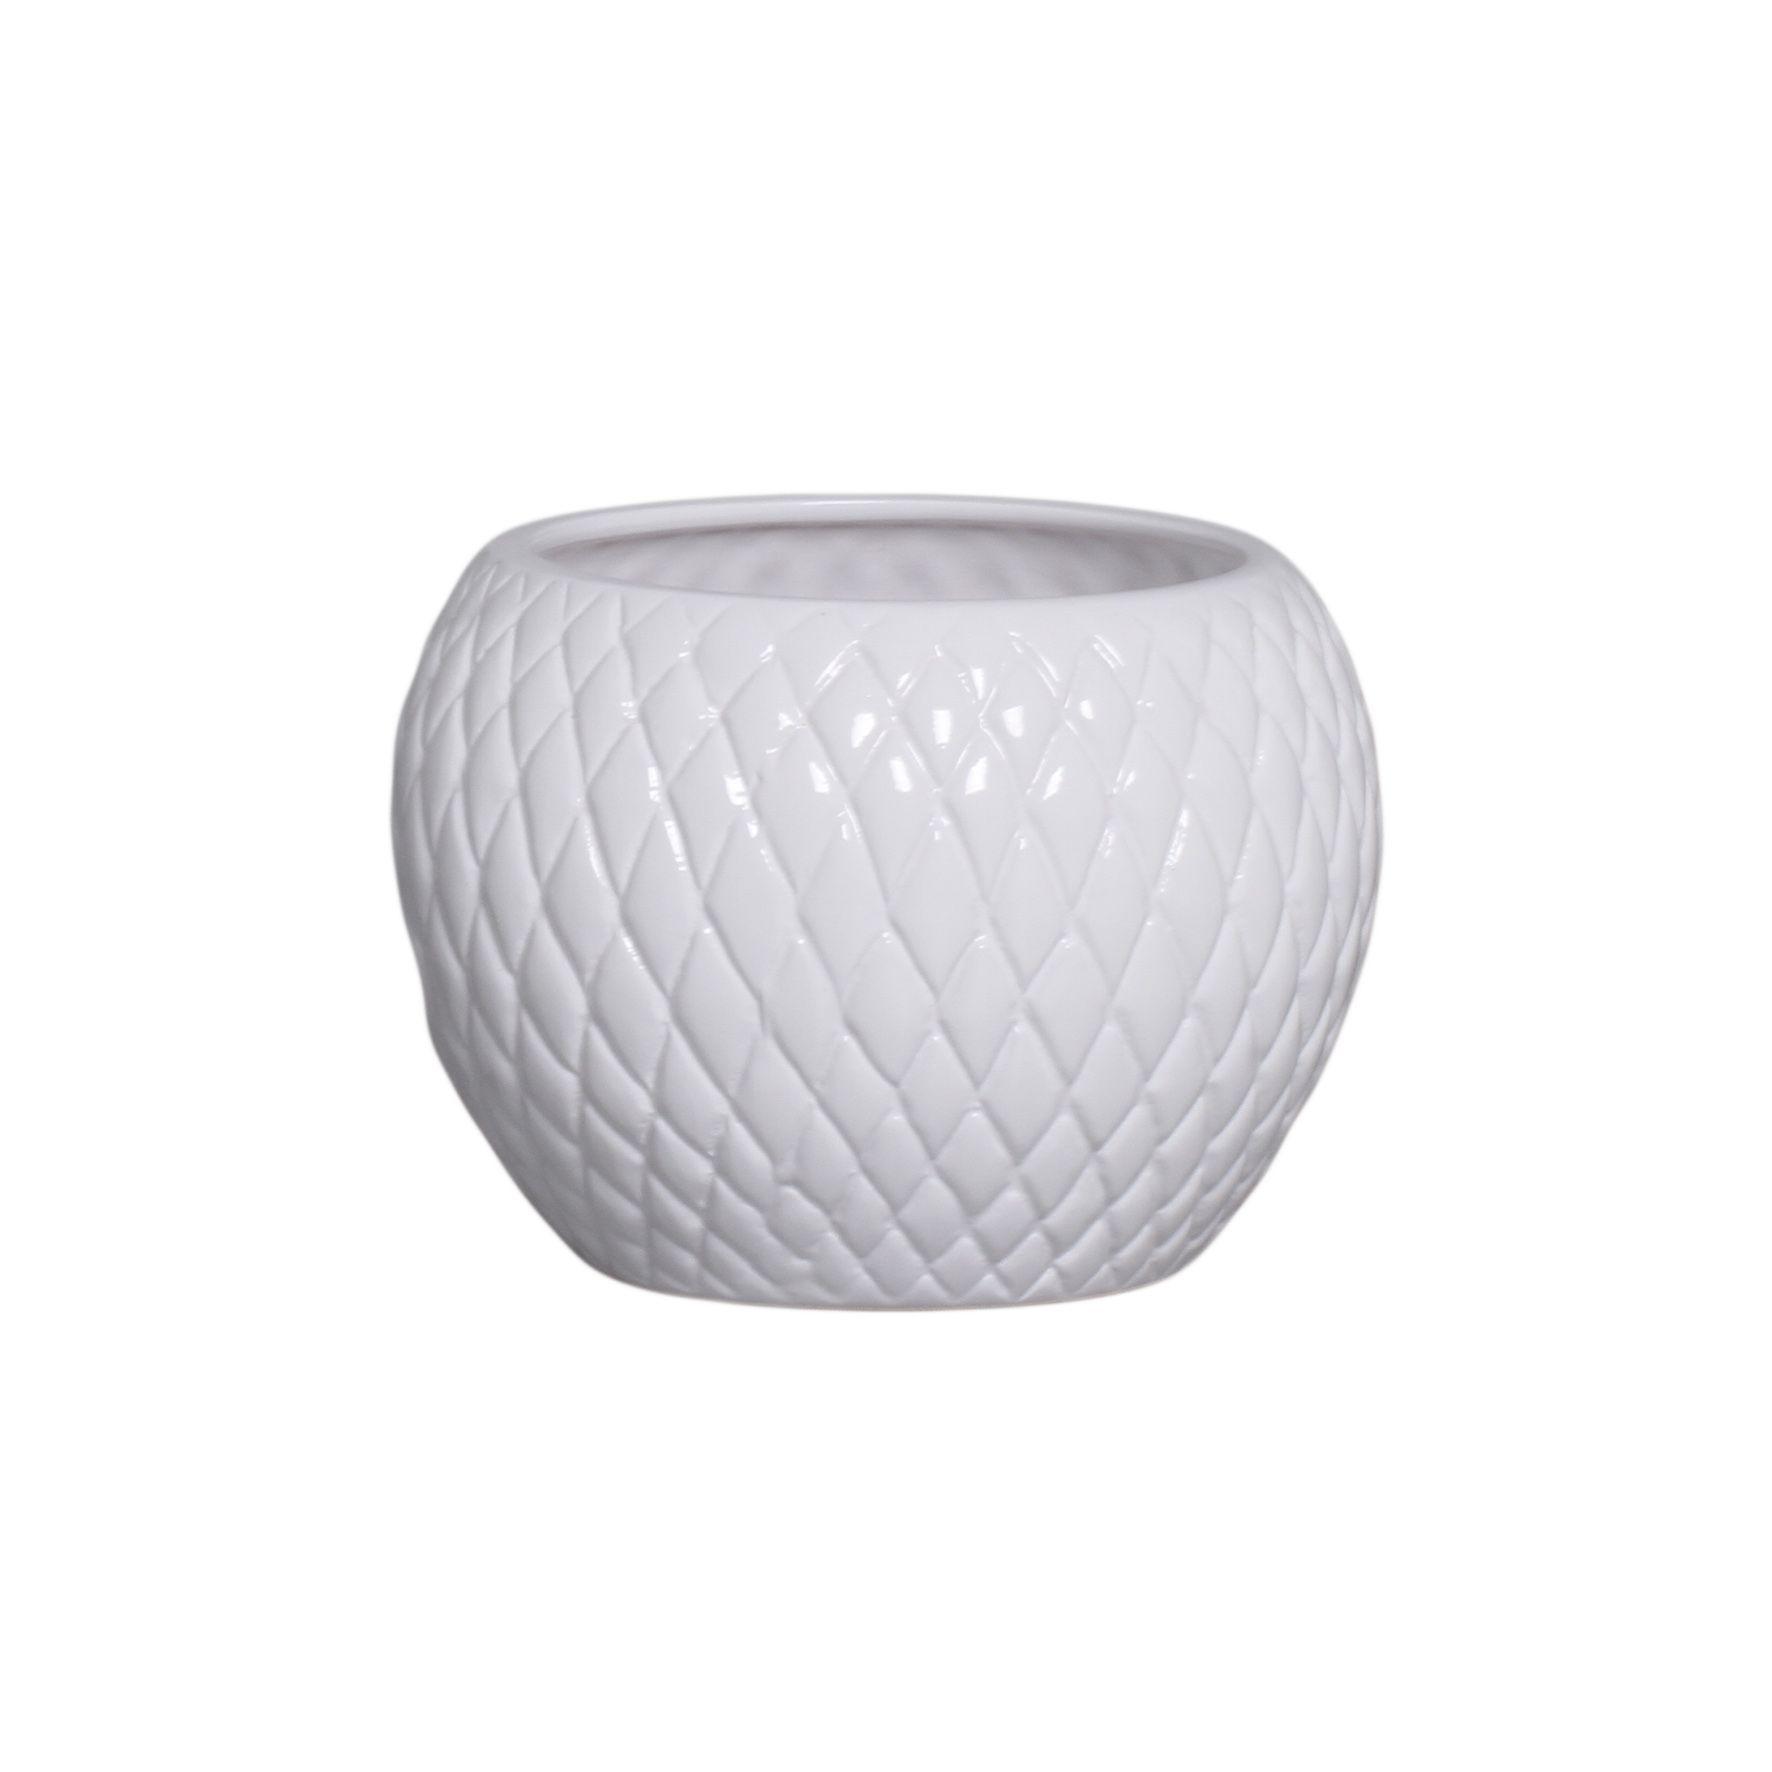 Cachepot de Cerâmica Branco P 14,3x19,3 cm